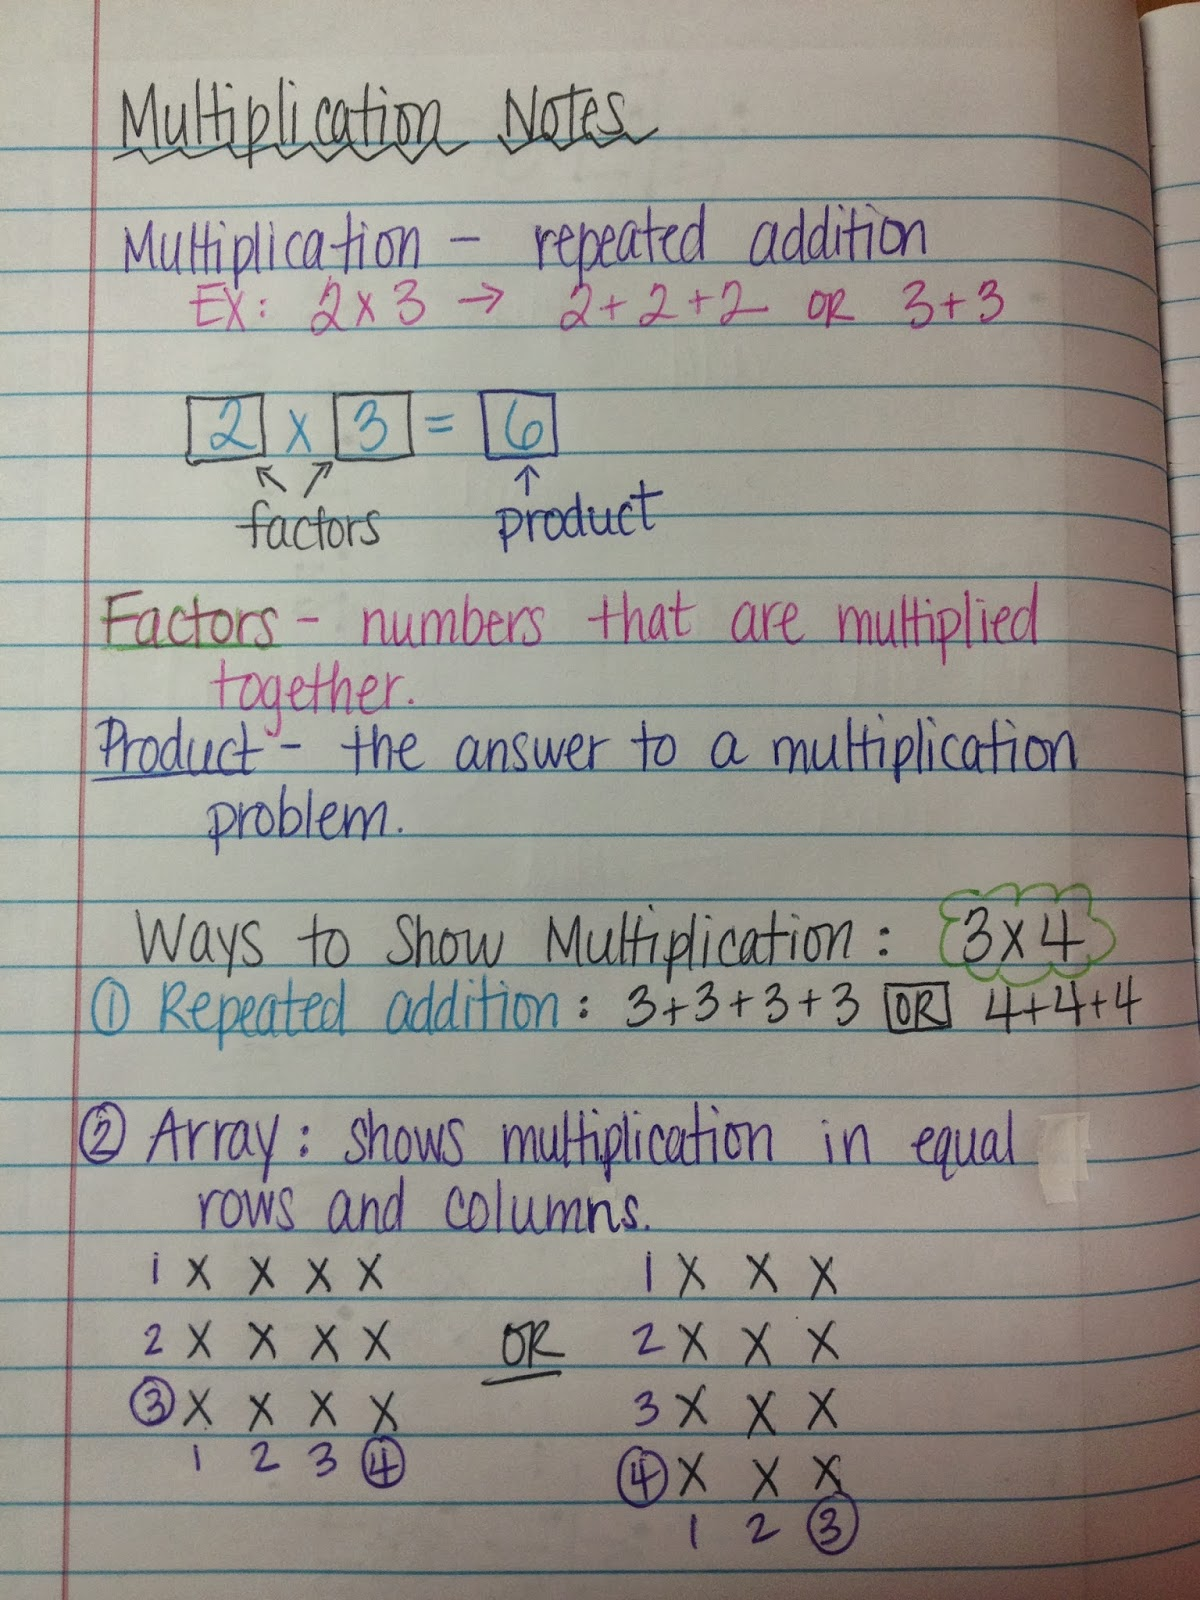 Identity Property Of Multiplication 4th Grade